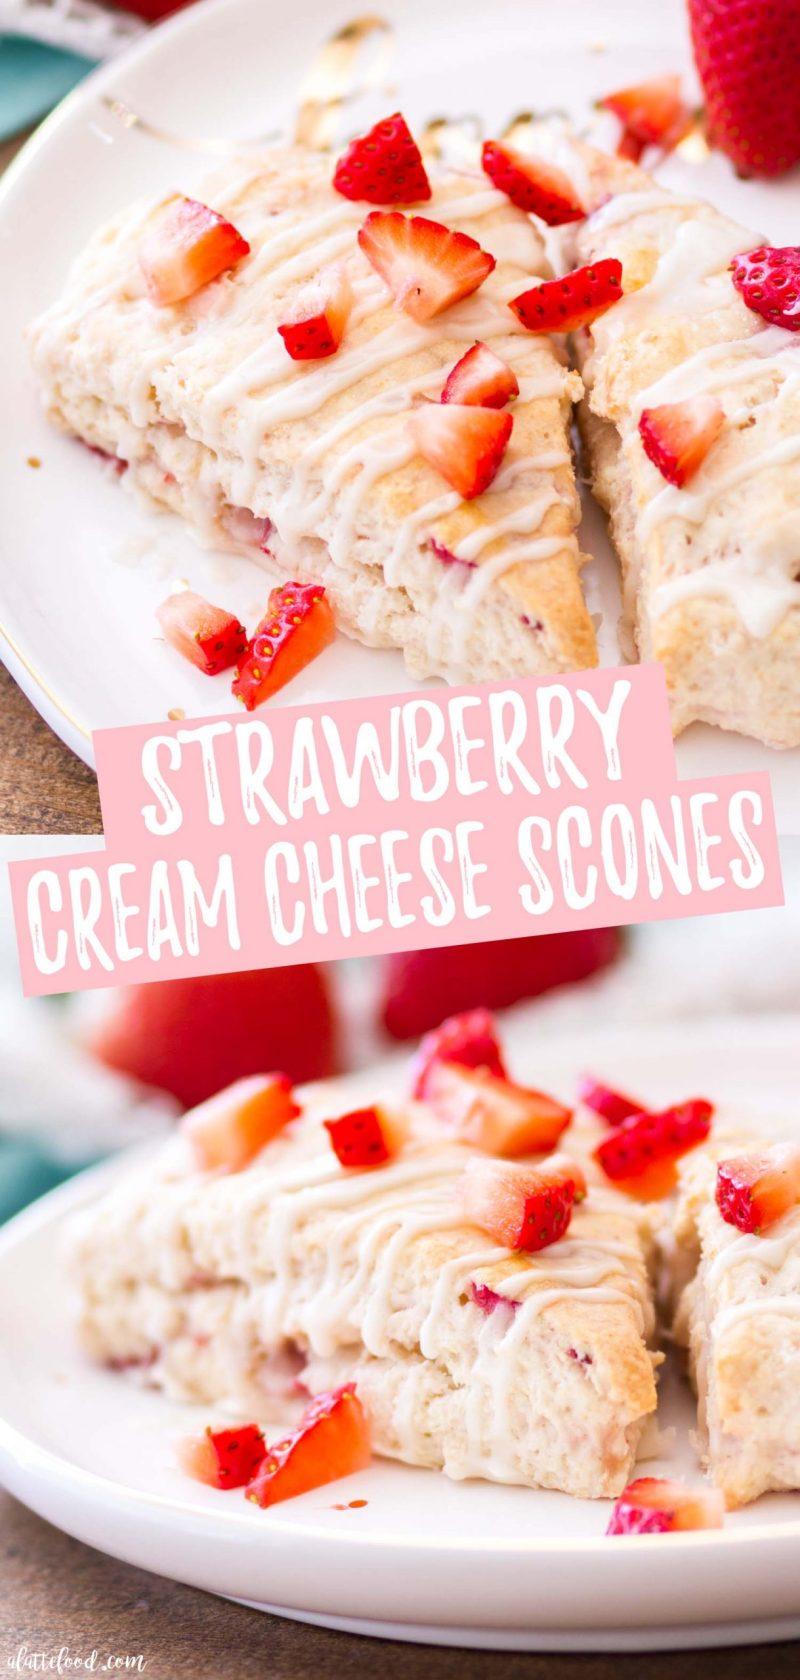 easy strawberry cream cheese scones collage